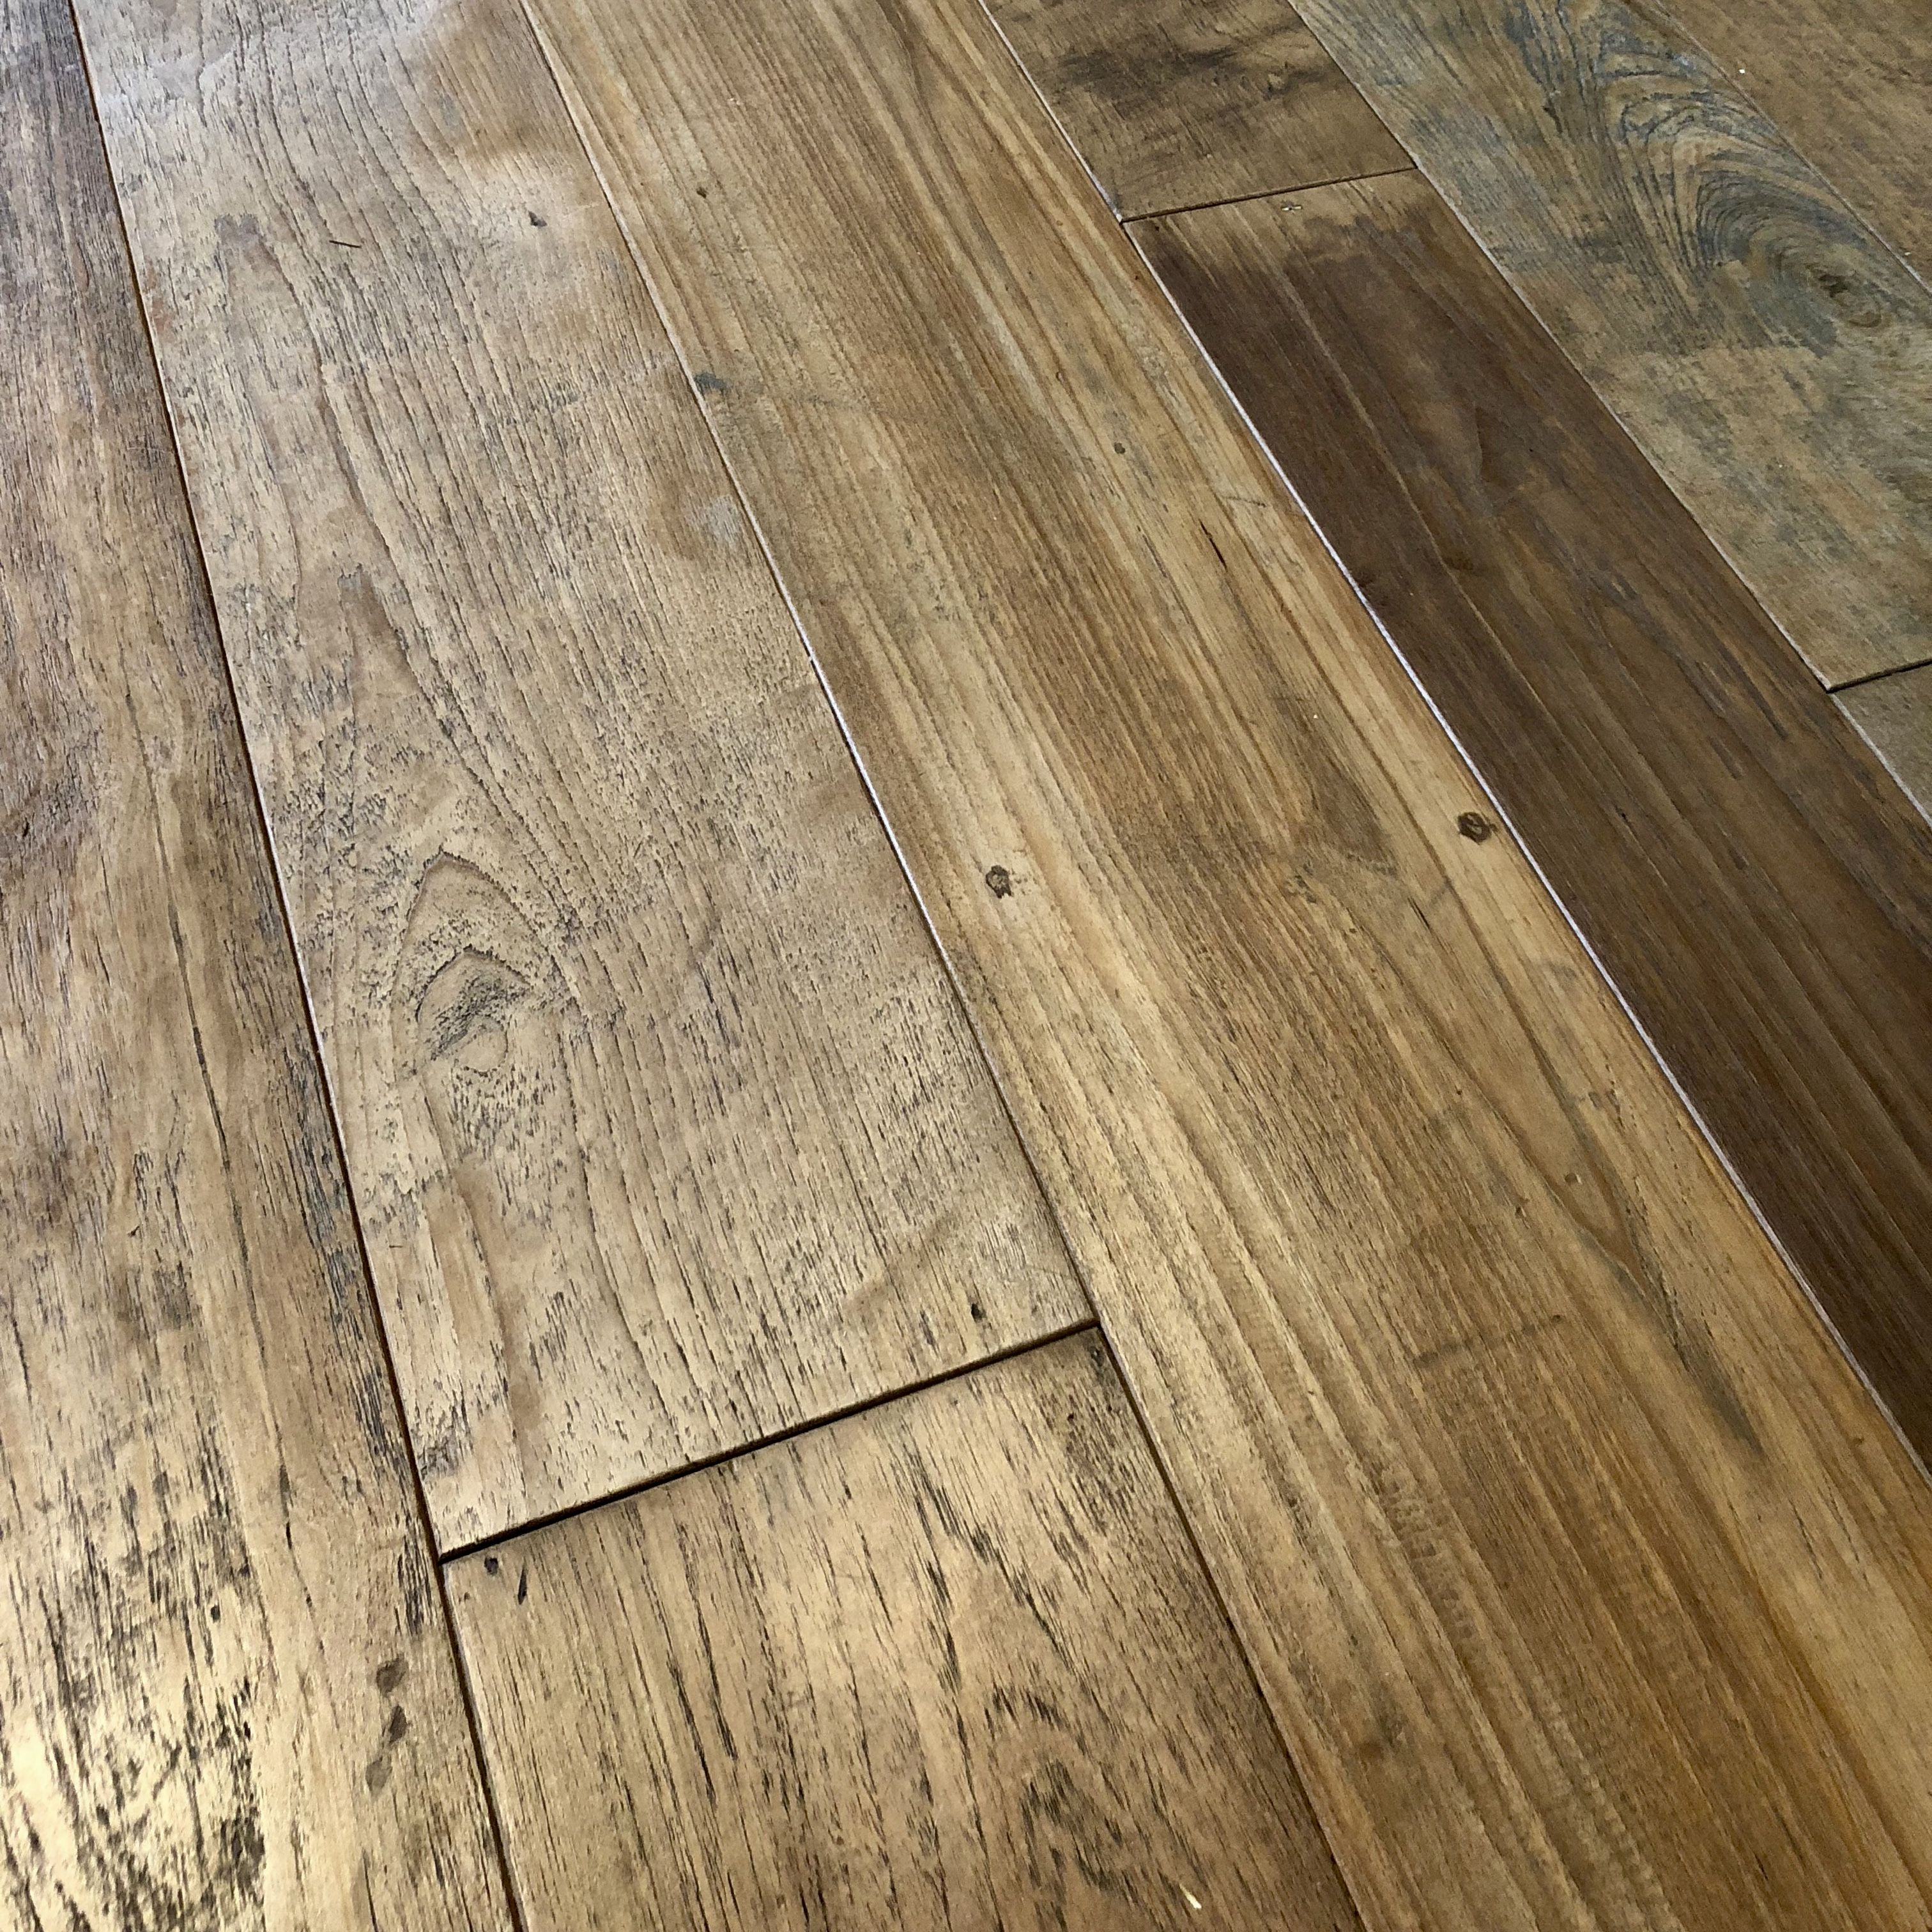 Reclaimed Teak Planking And Flooring